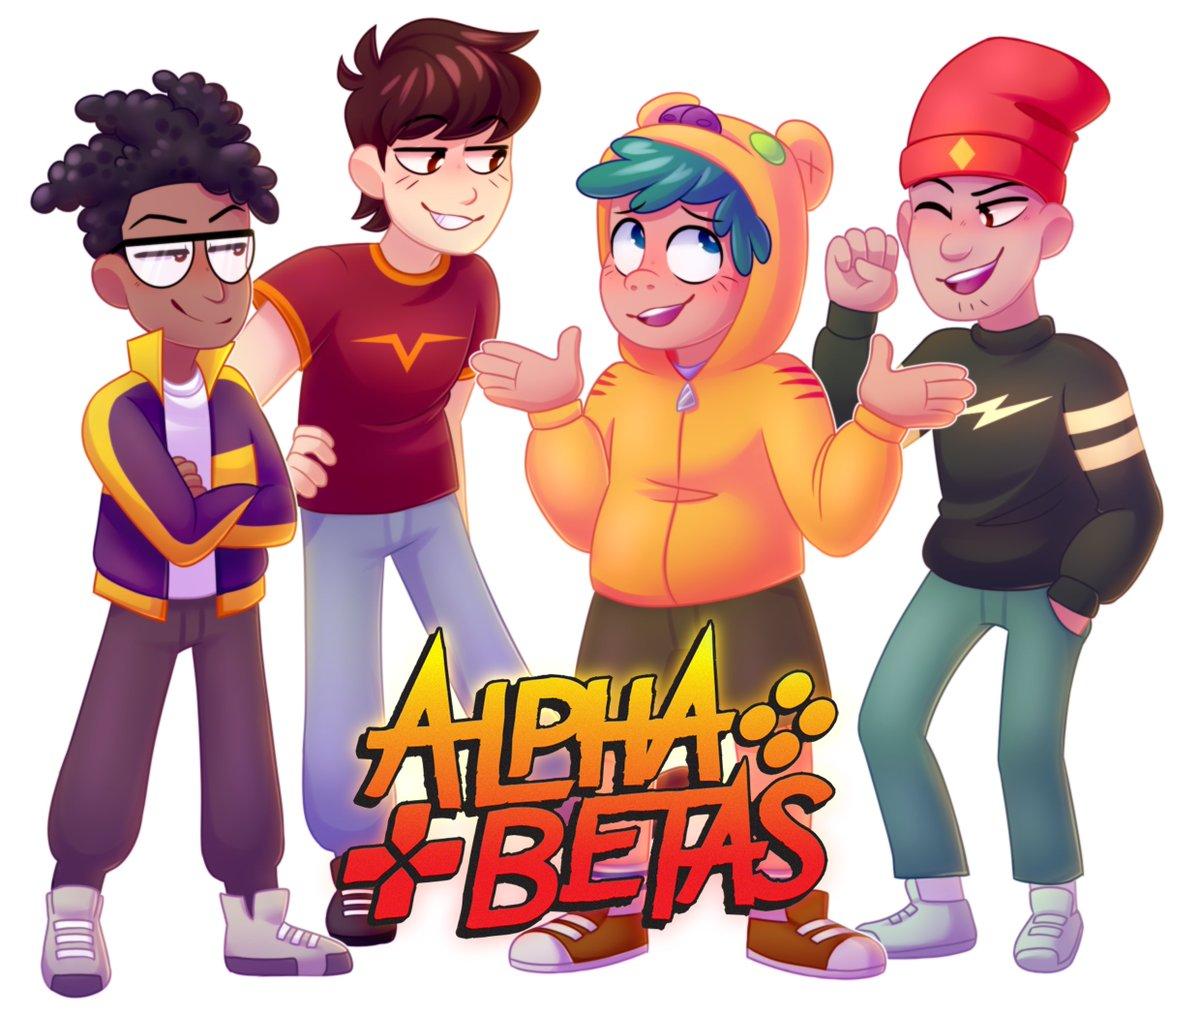 Hyped for Alpha Betas!!! https://t.co/b0eTolTIUU